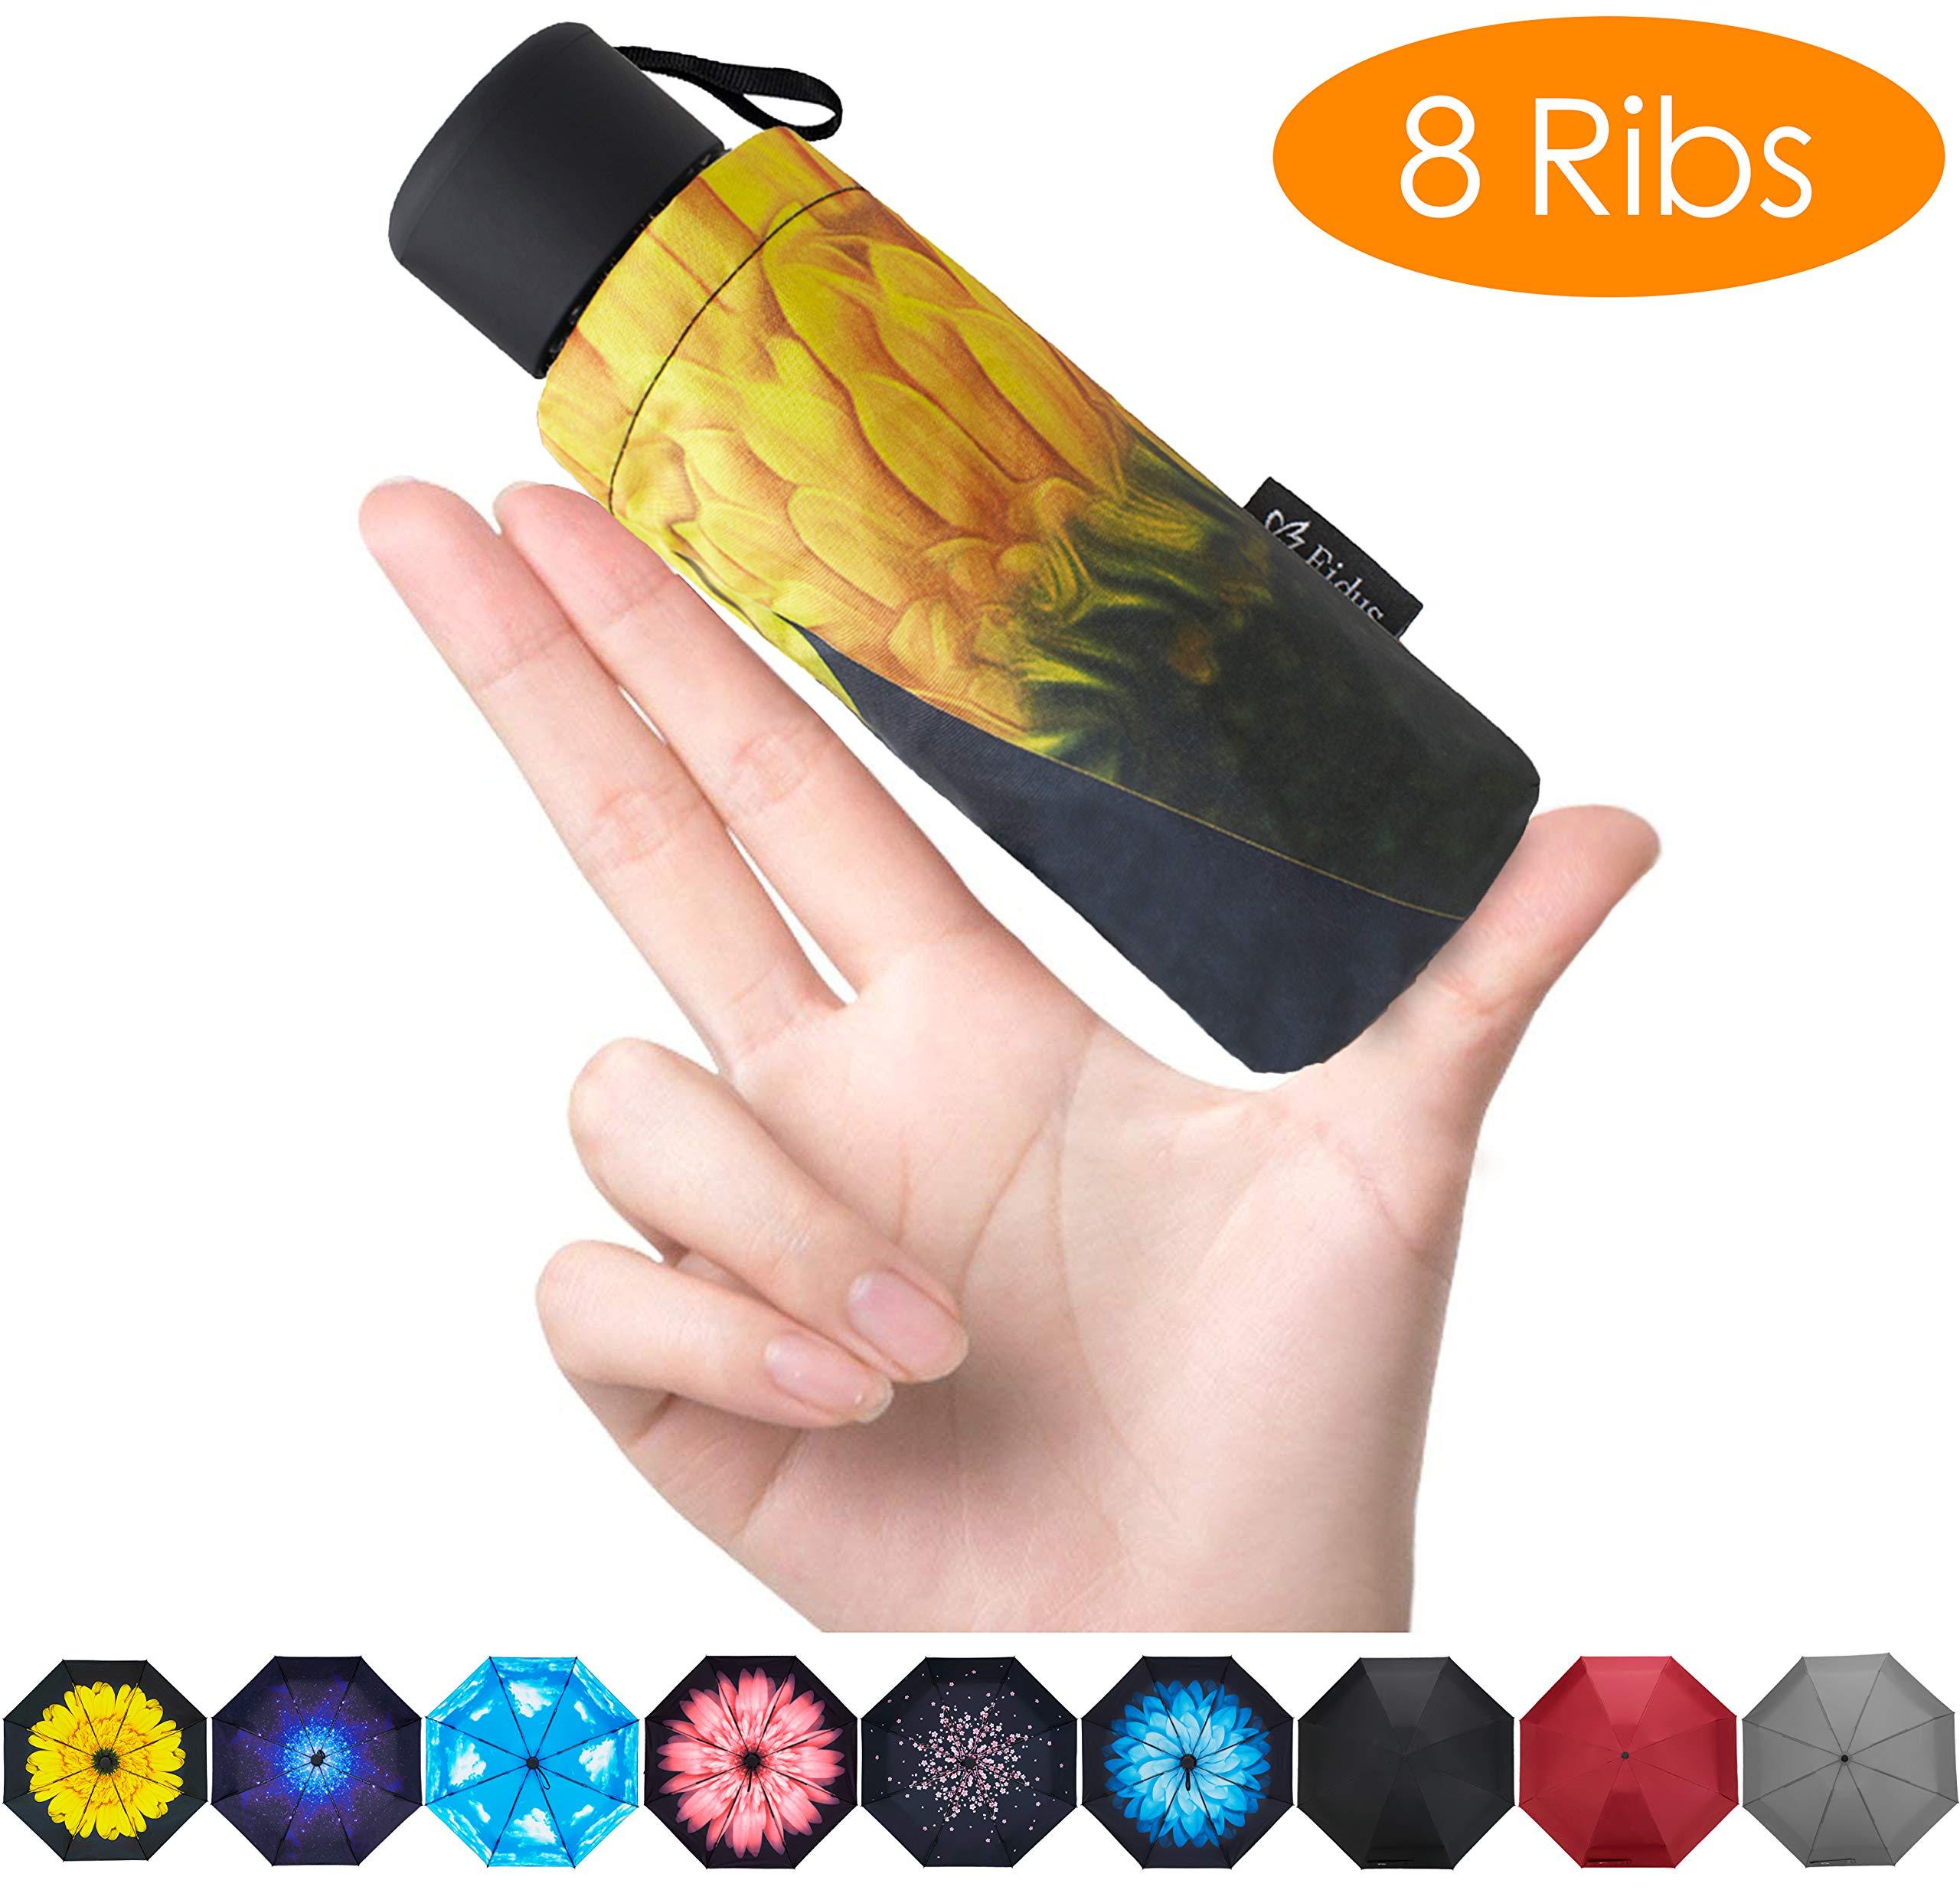 FidusUpgraded 8 Ribs Mini Portable Sun&Rain Lightweight WindproofUmbrella - Compact Parasol Outdoor Travel Umbrella for MenWomen Kids-Sunflower by Fidus